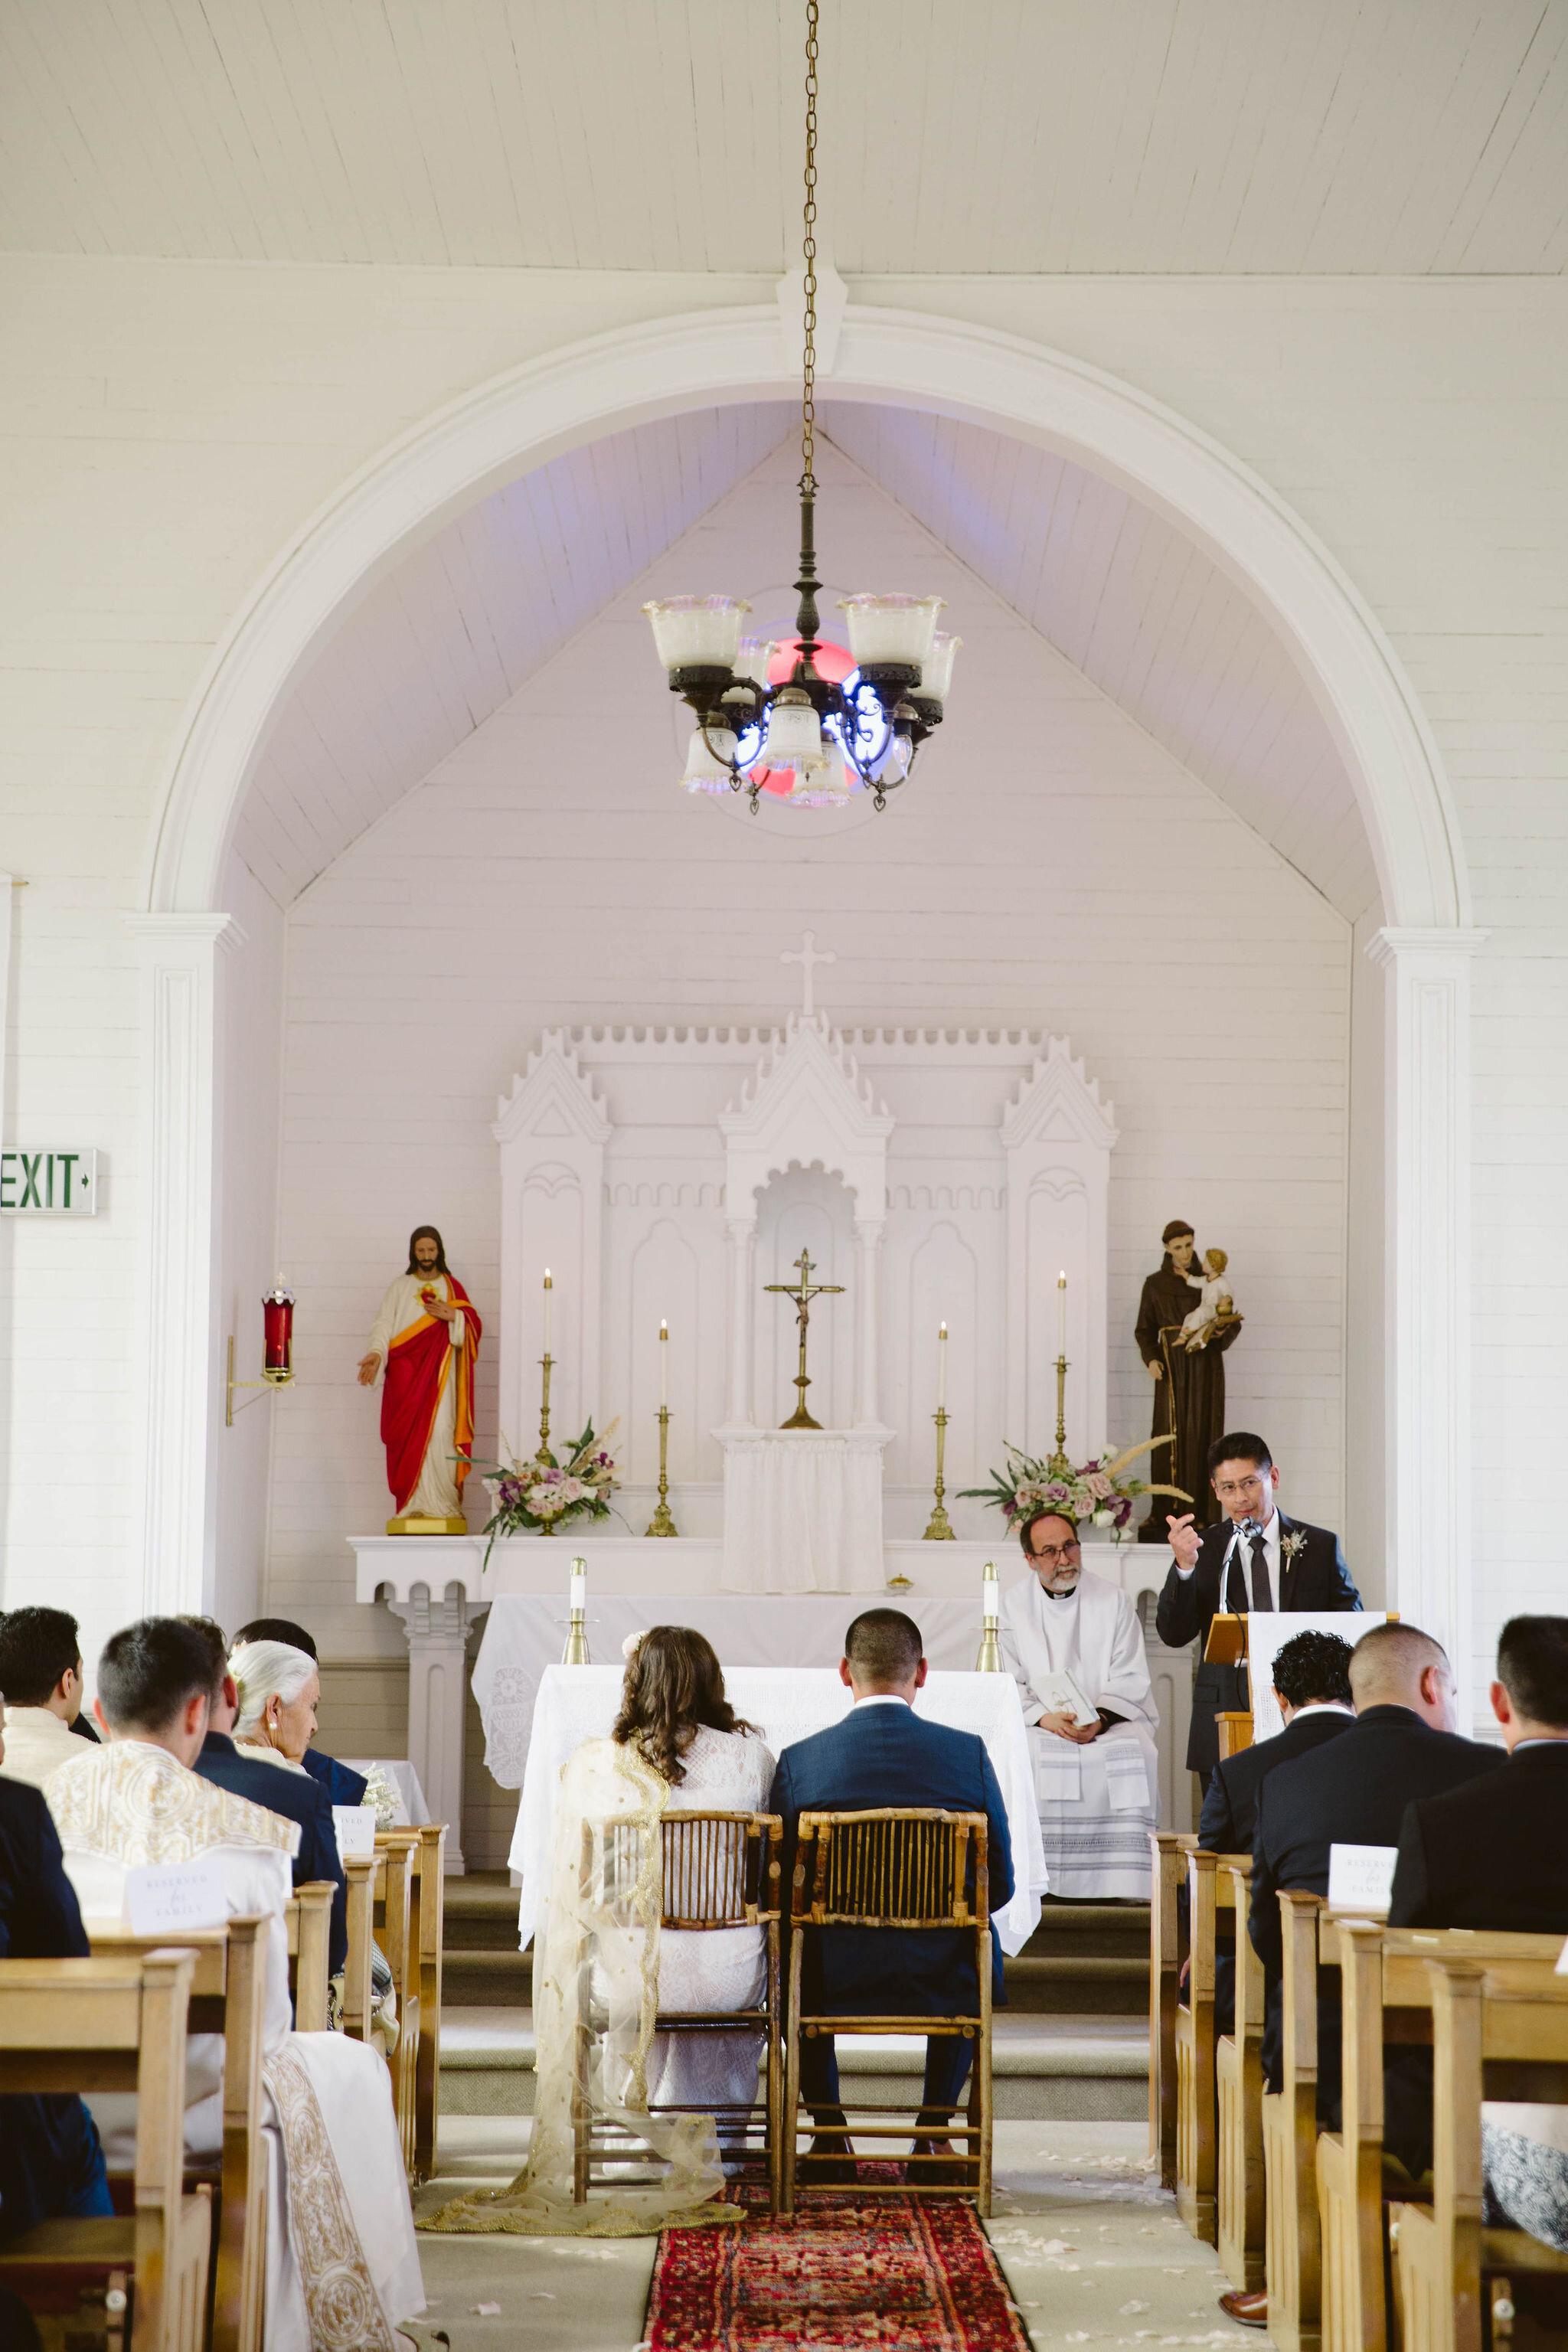 Venture-Retreat-Center-Wedding-Pescadero-Sat-Aaron-Pritam-The-Shalom-Imaginative-232.jpg